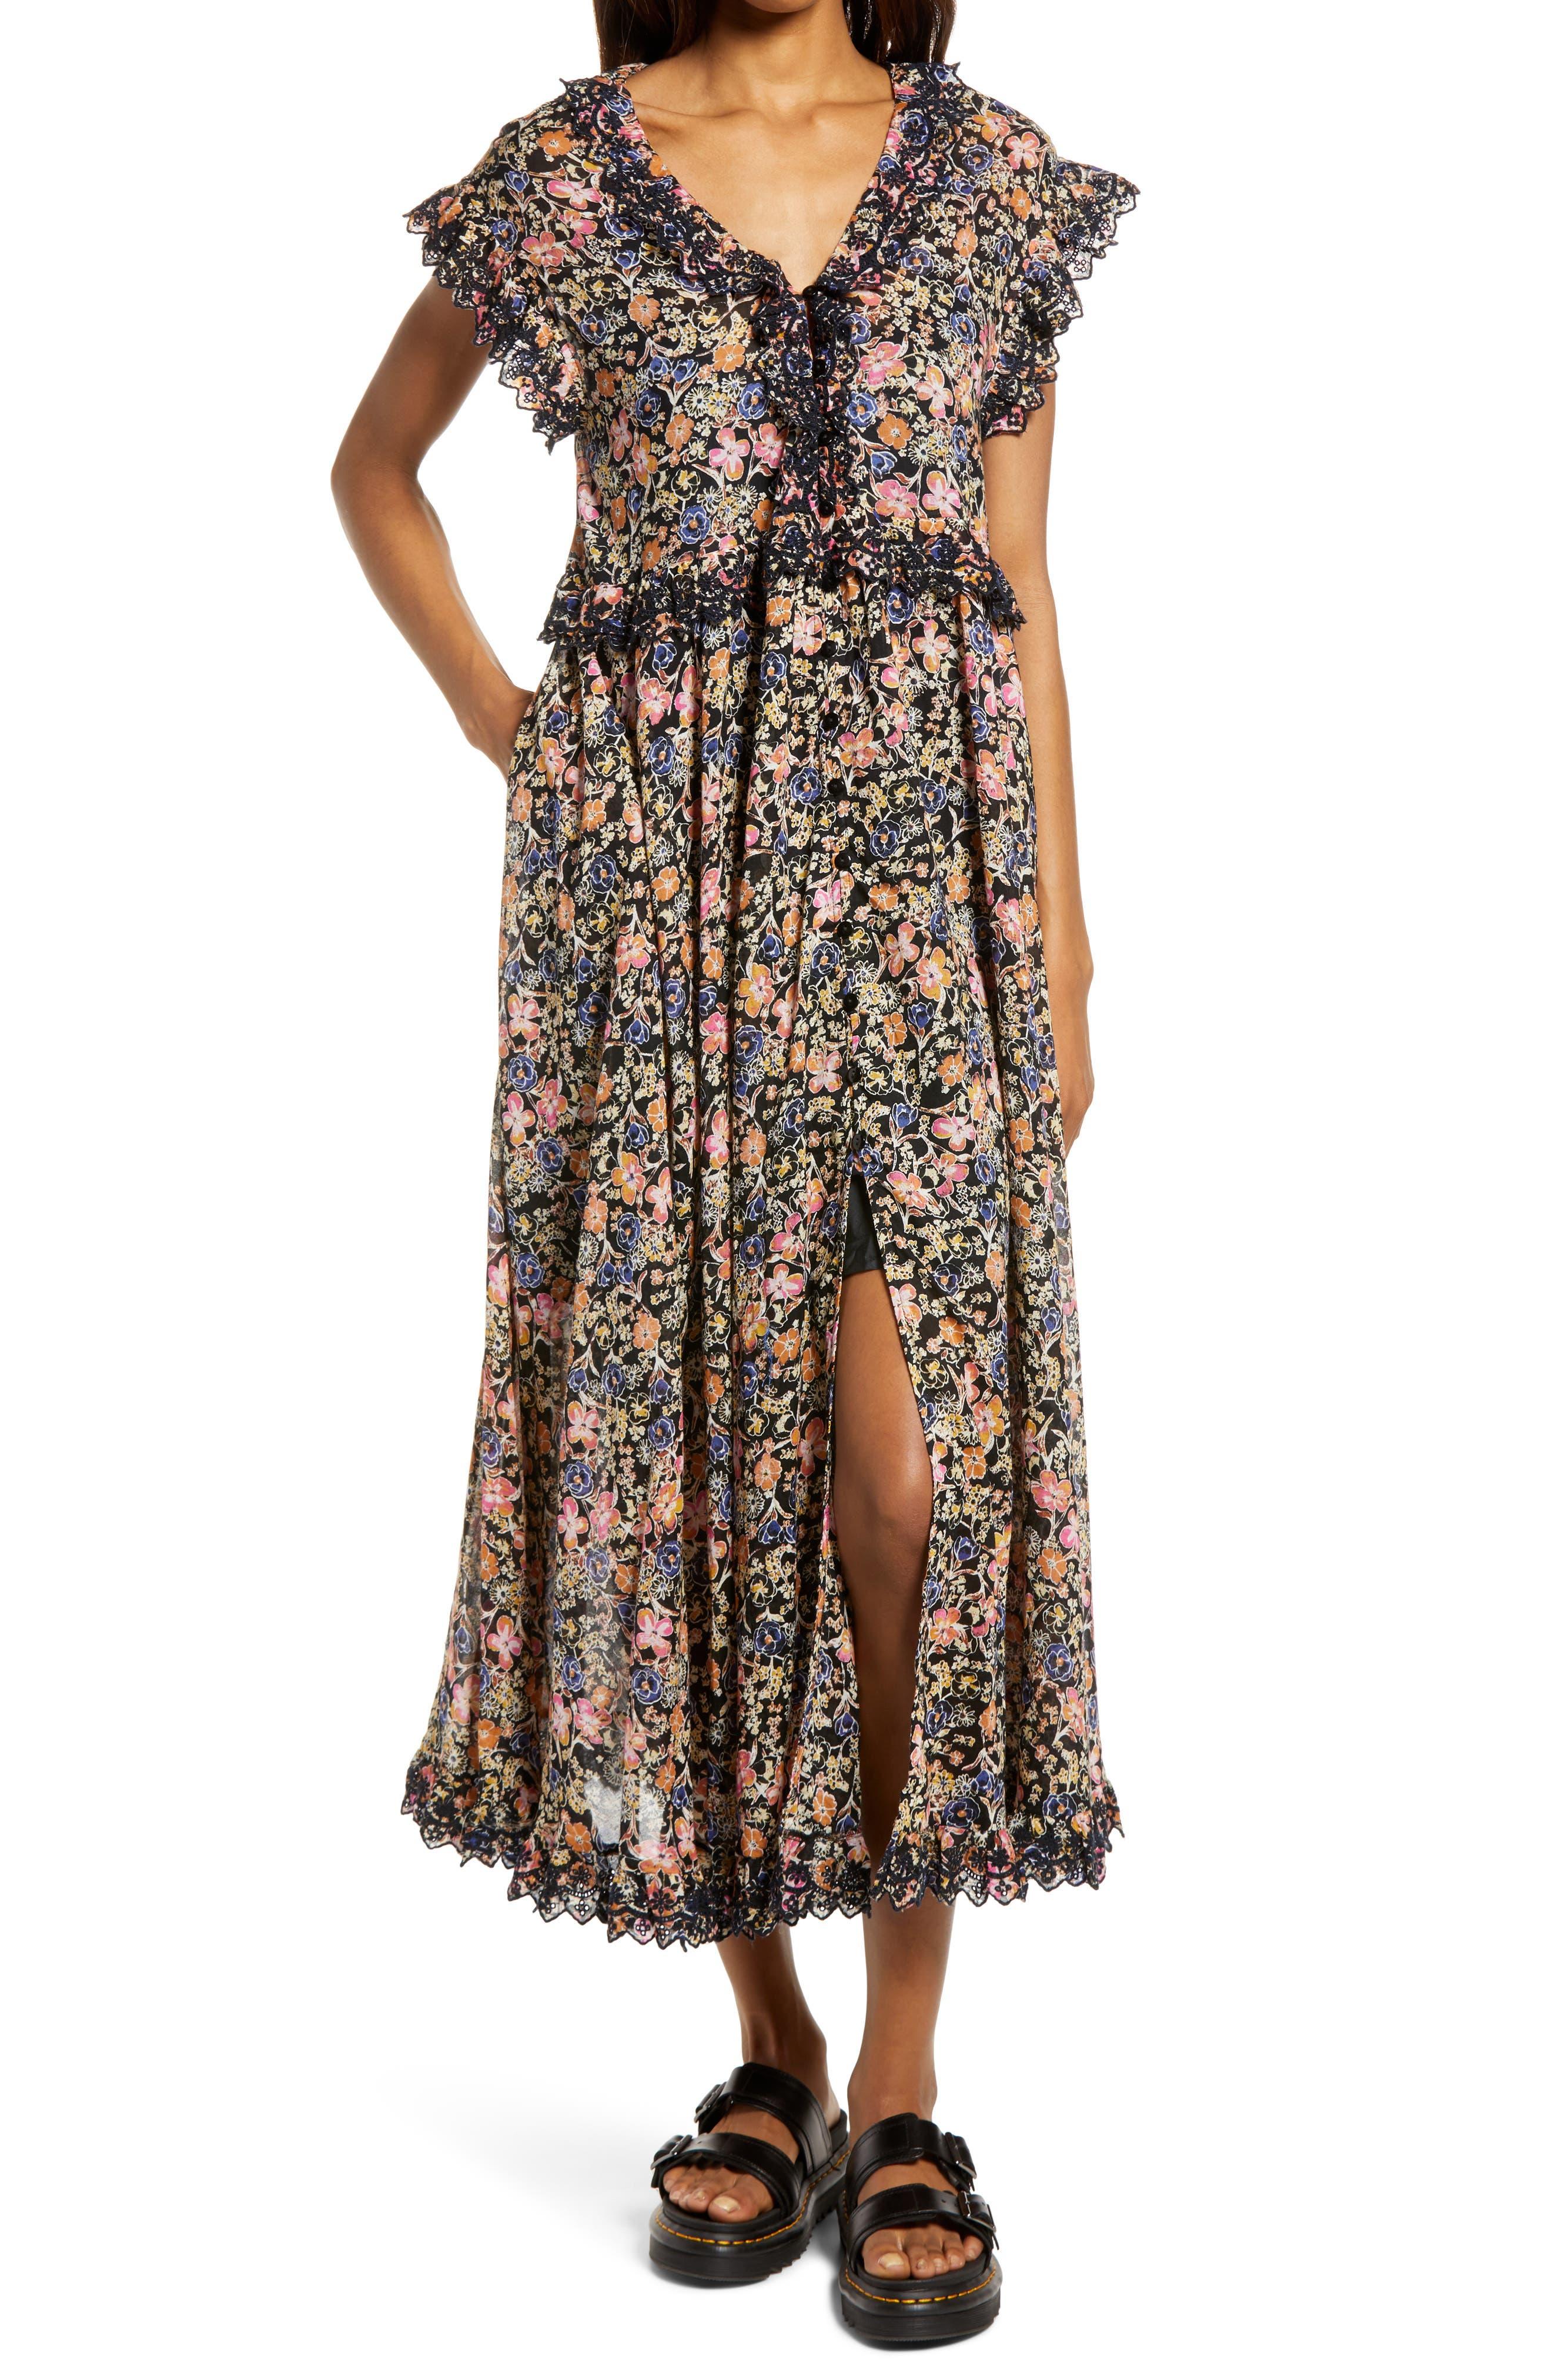 Milania Maxi Dress